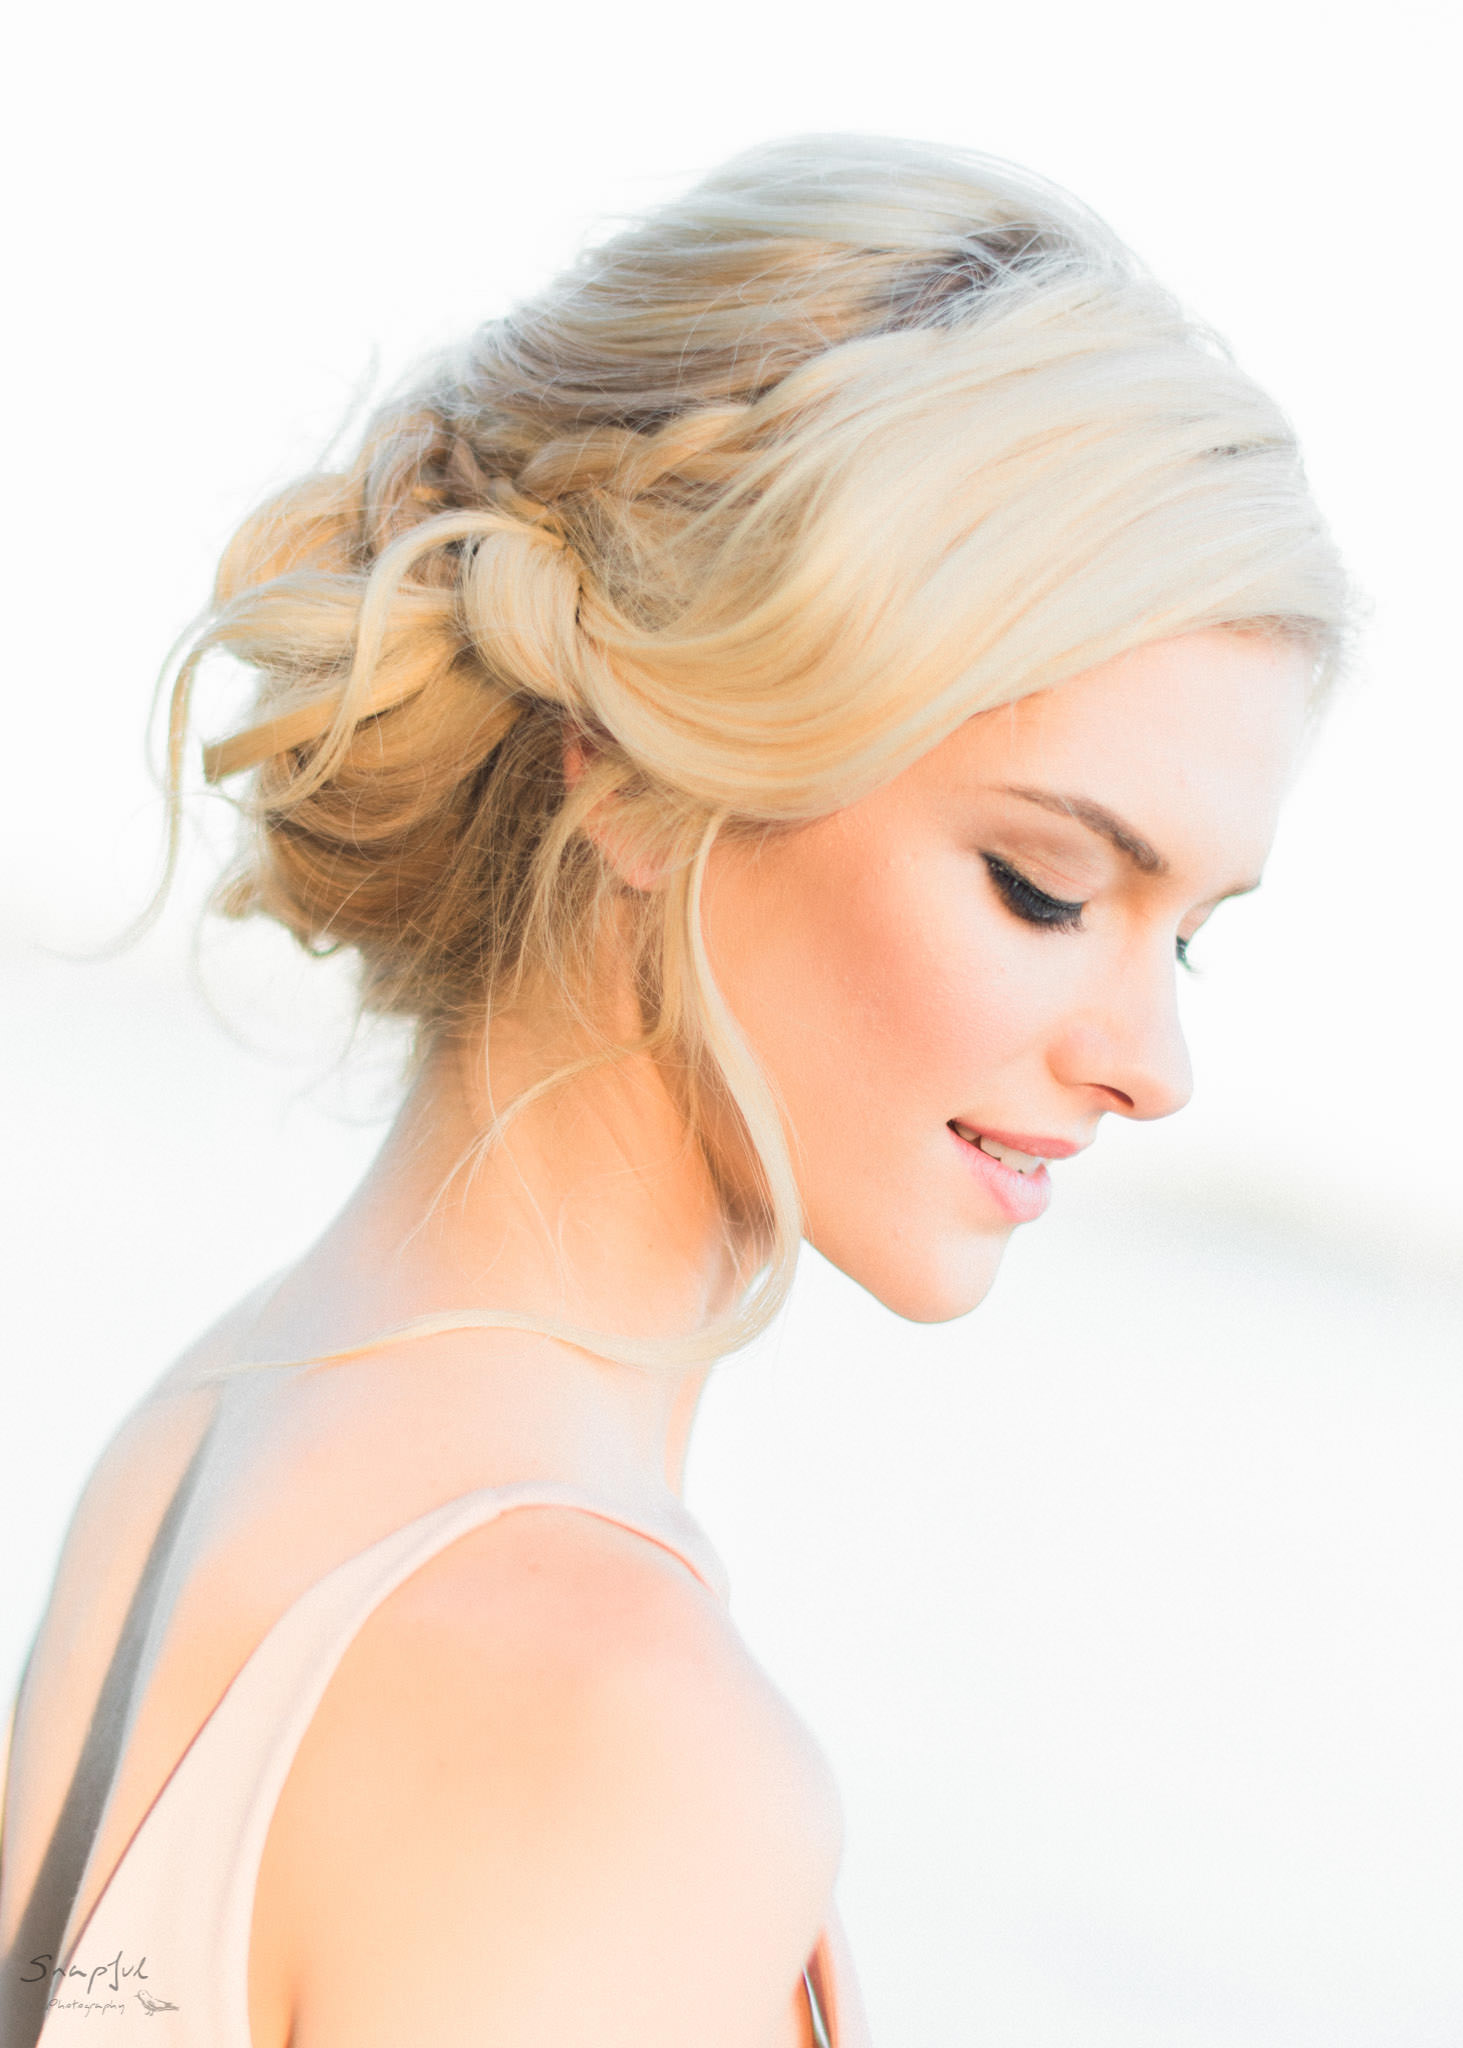 Portrait of beautiful bride at sunset